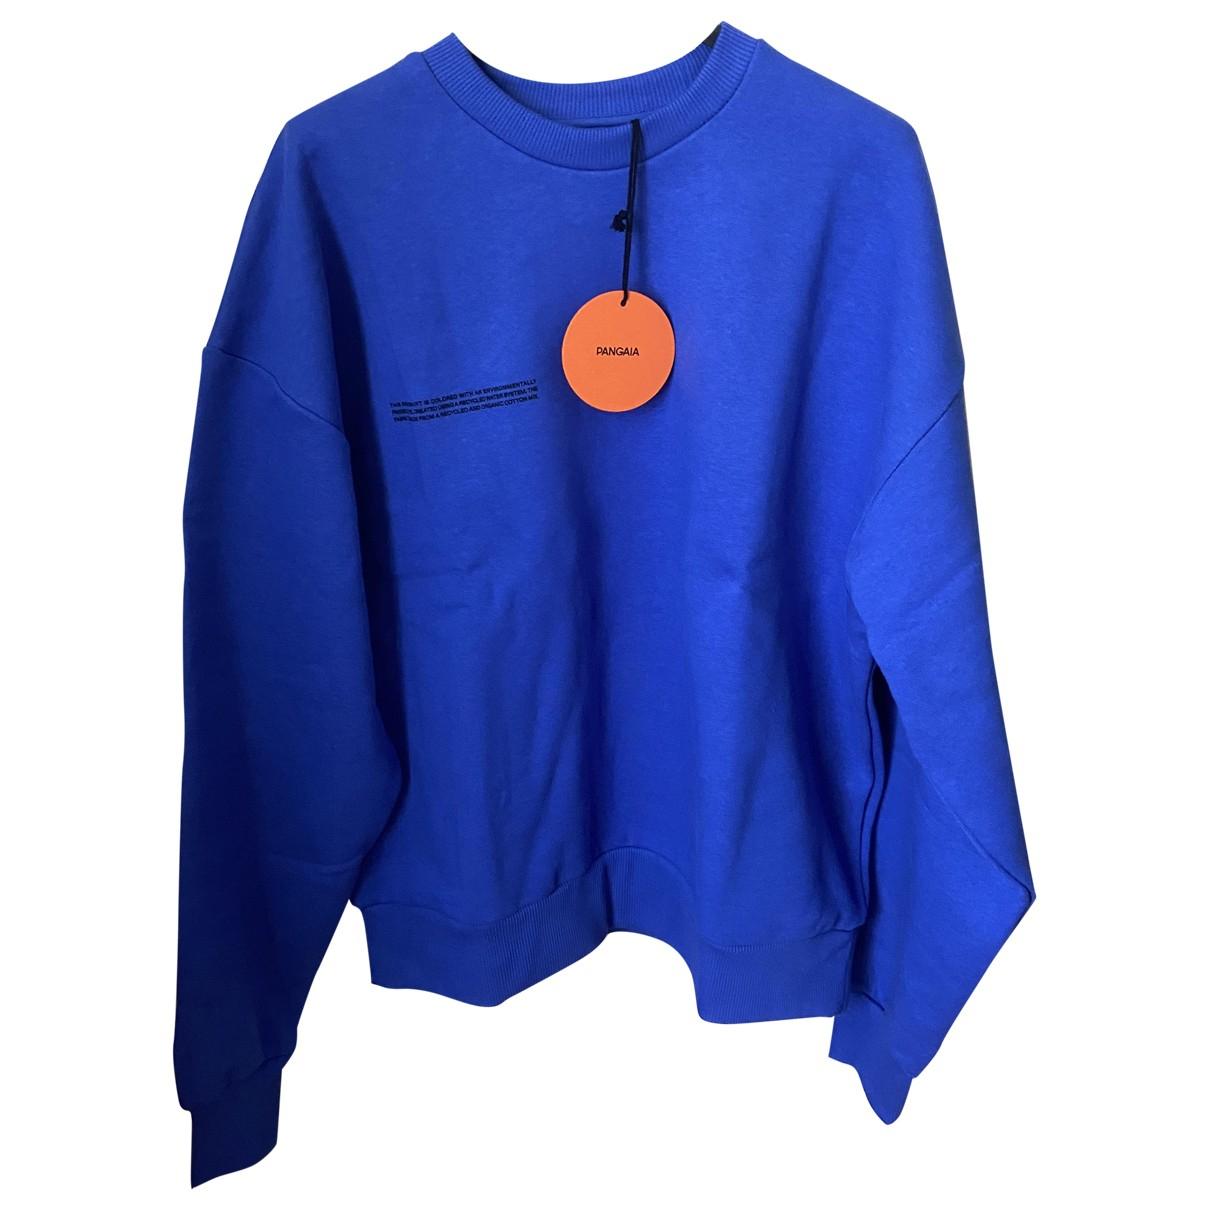 The Pangaia \N Blue Cotton Knitwear for Women M International